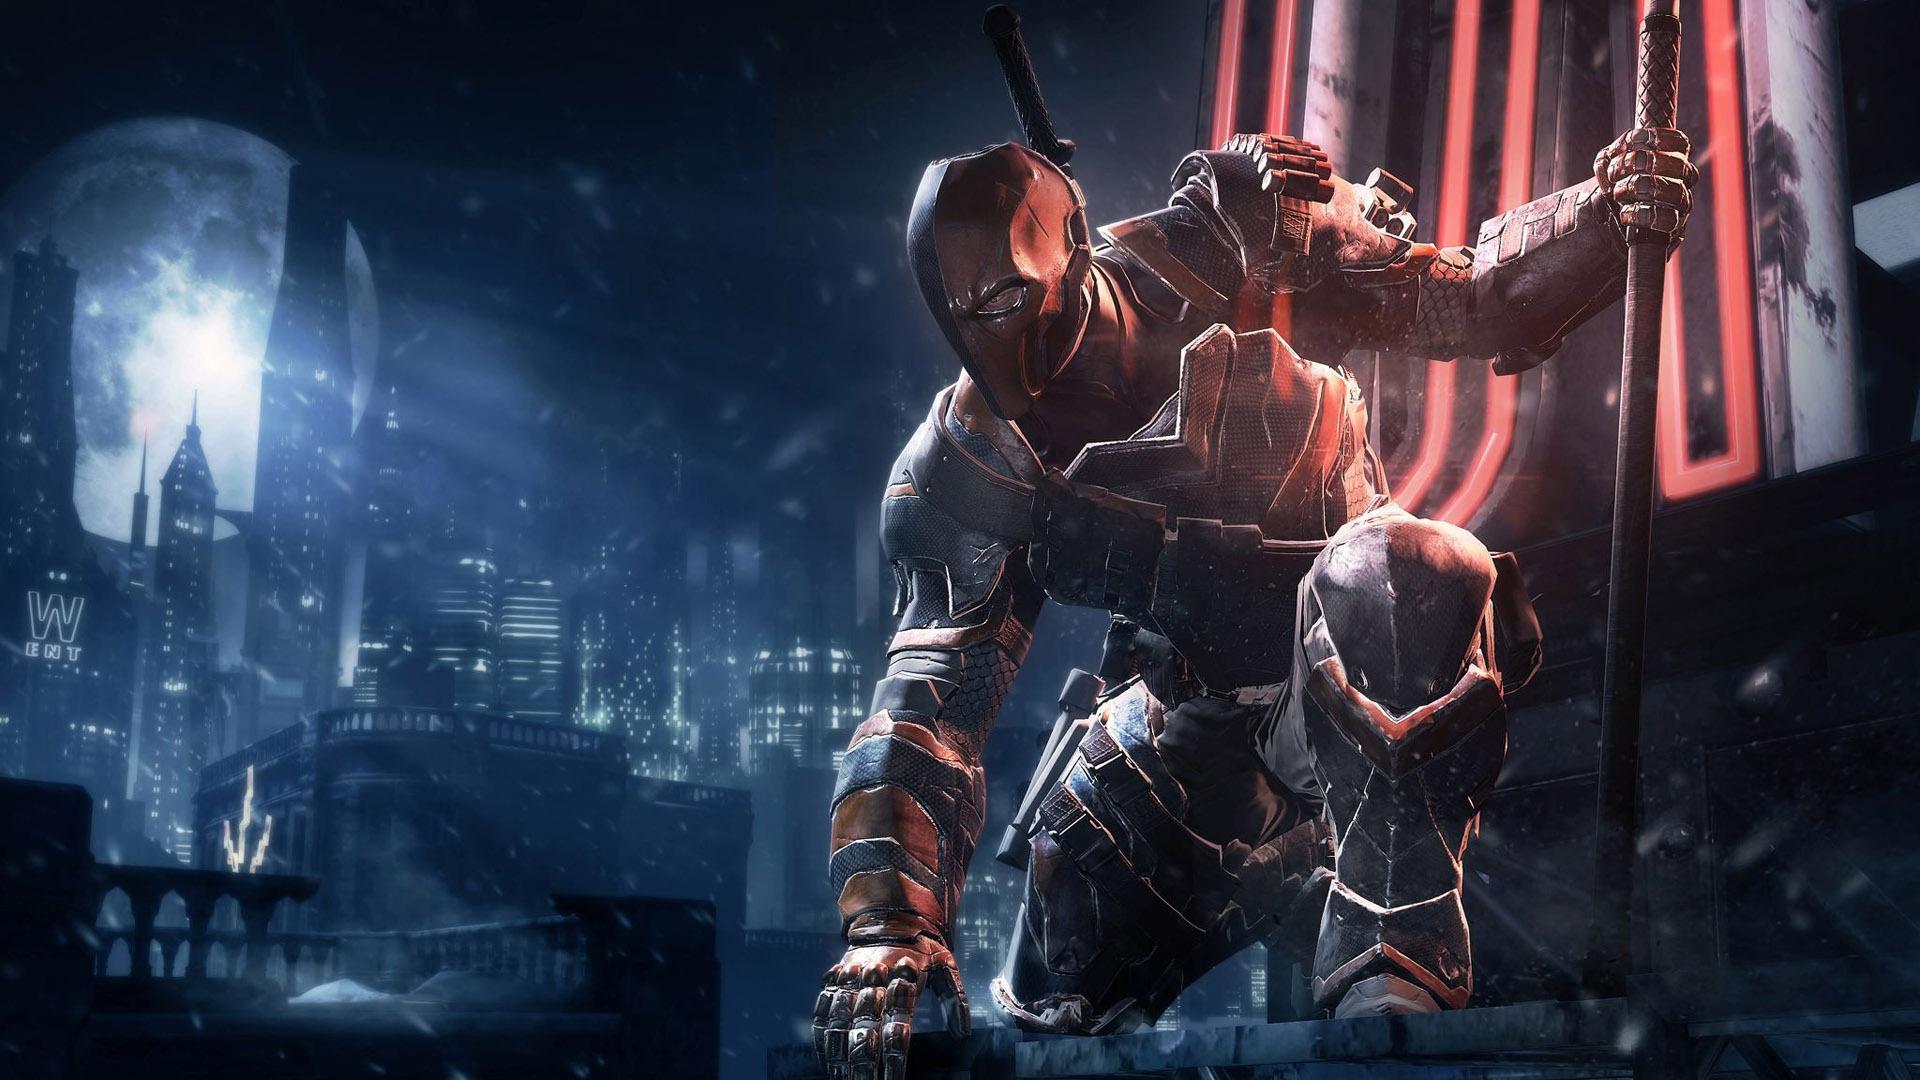 batman arkham origins deathstroke hd games 4k wallpapers